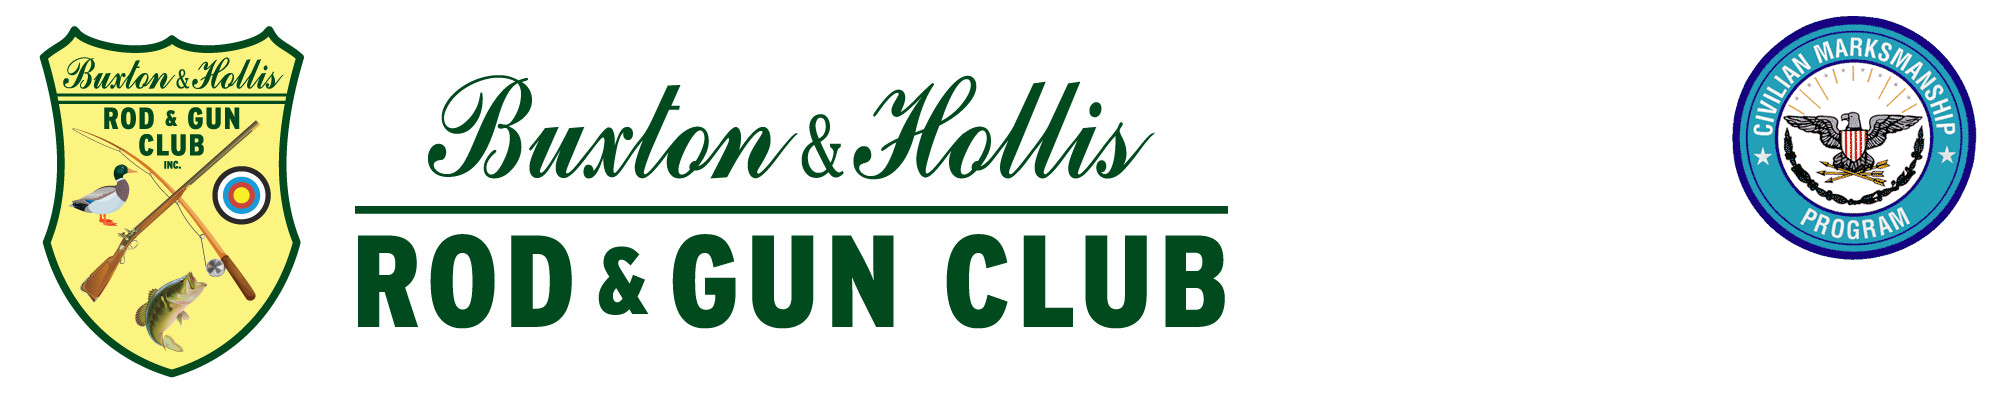 Rimfire Benchrest – Buxton Hollis Rod and Gun Club